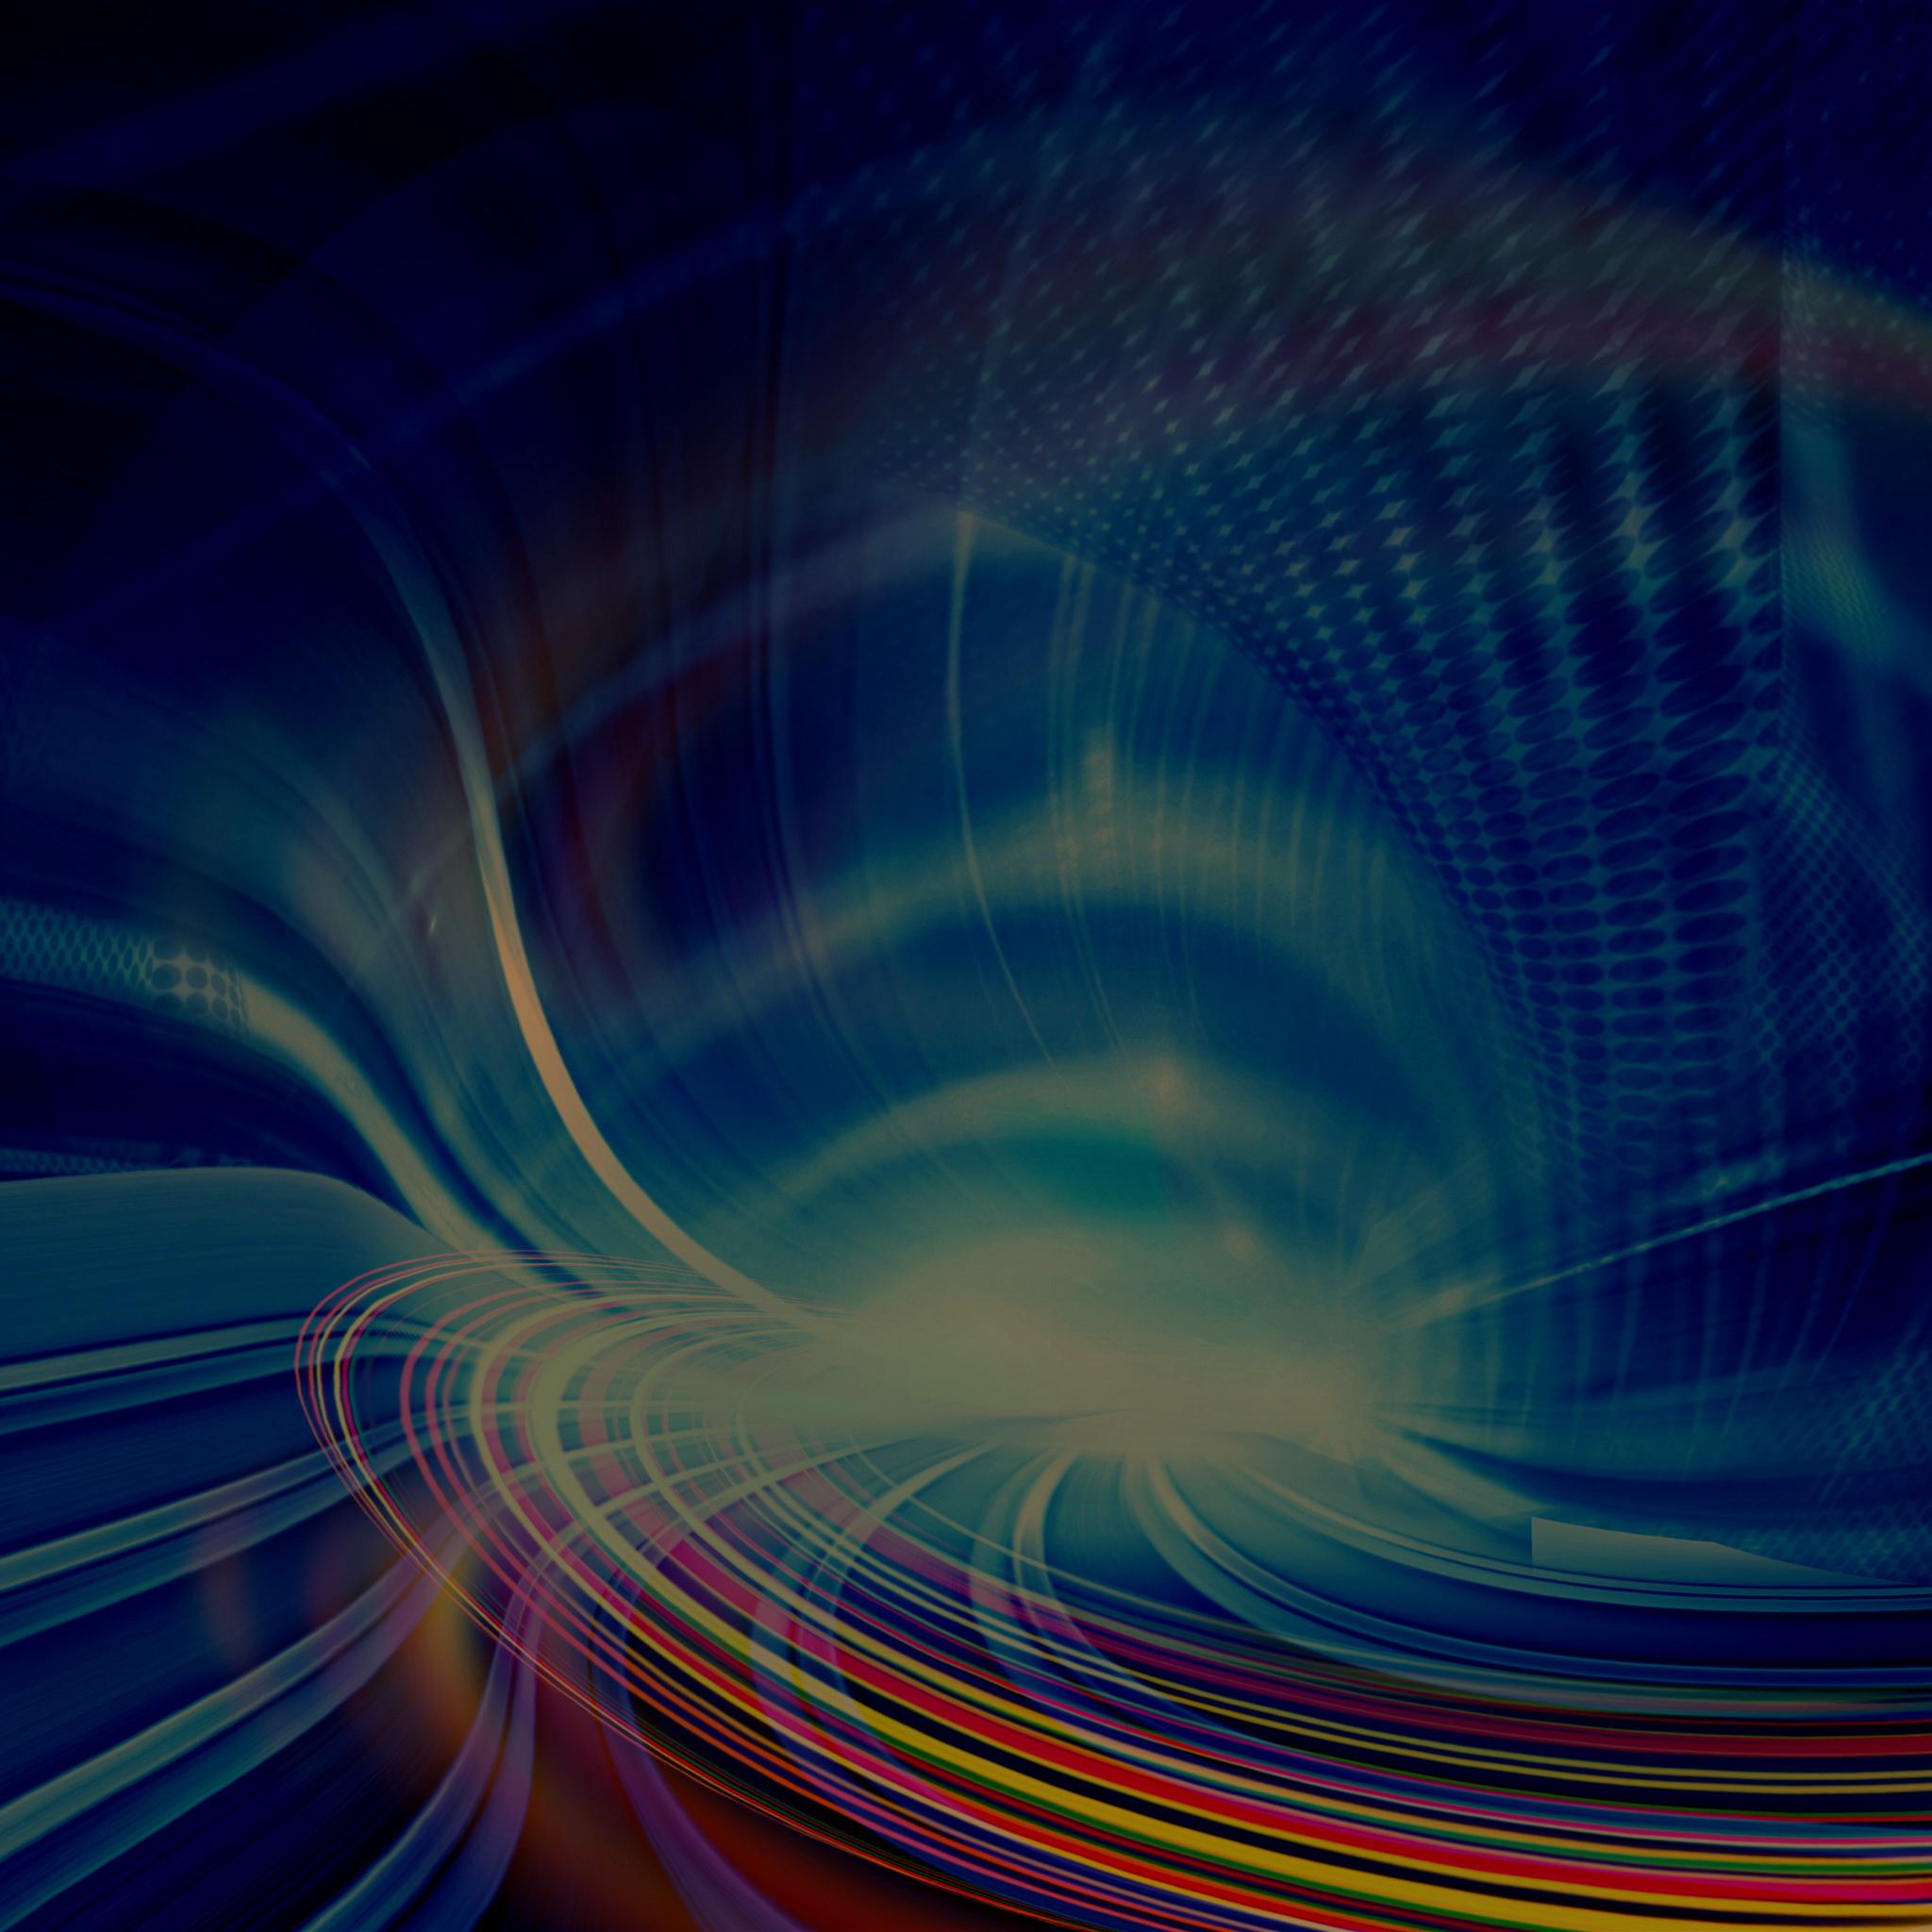 50 retina ipad air 2 wallpaper on wallpapersafari - Retina display wallpapers ipad 2 ...